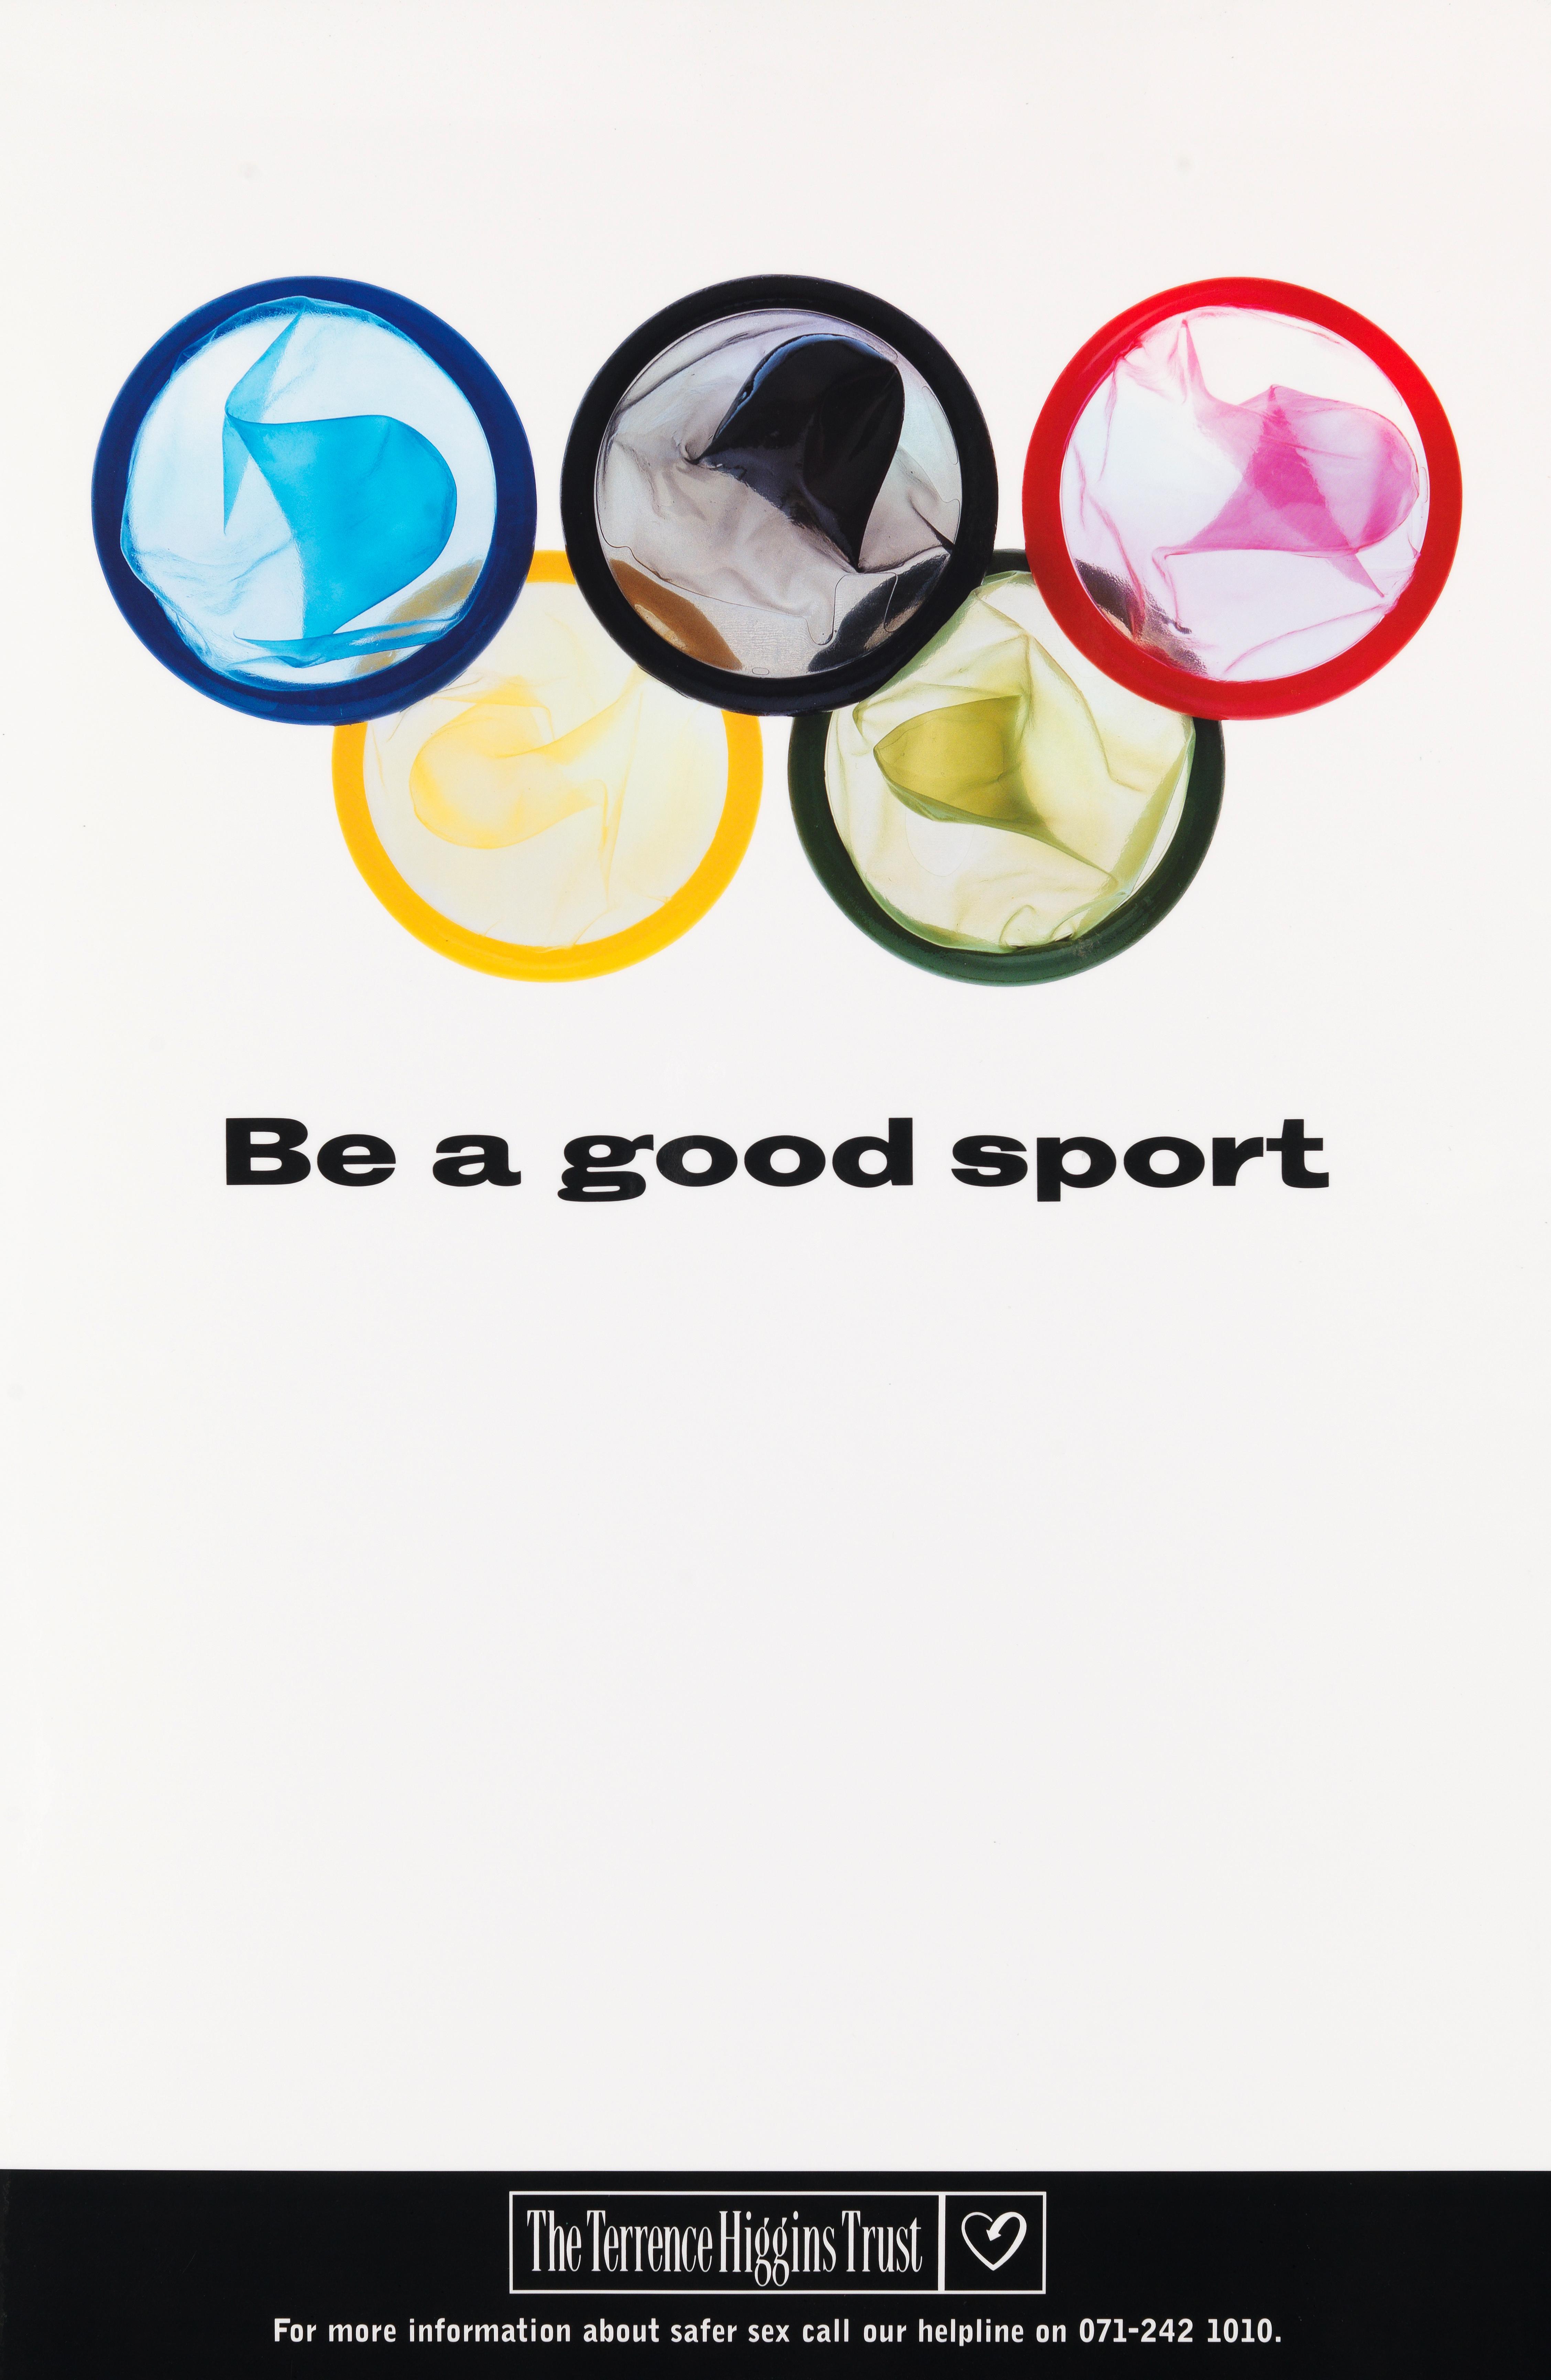 olympics-terrence-higgins-trust-chris-palmer-mark-denton-spdcj